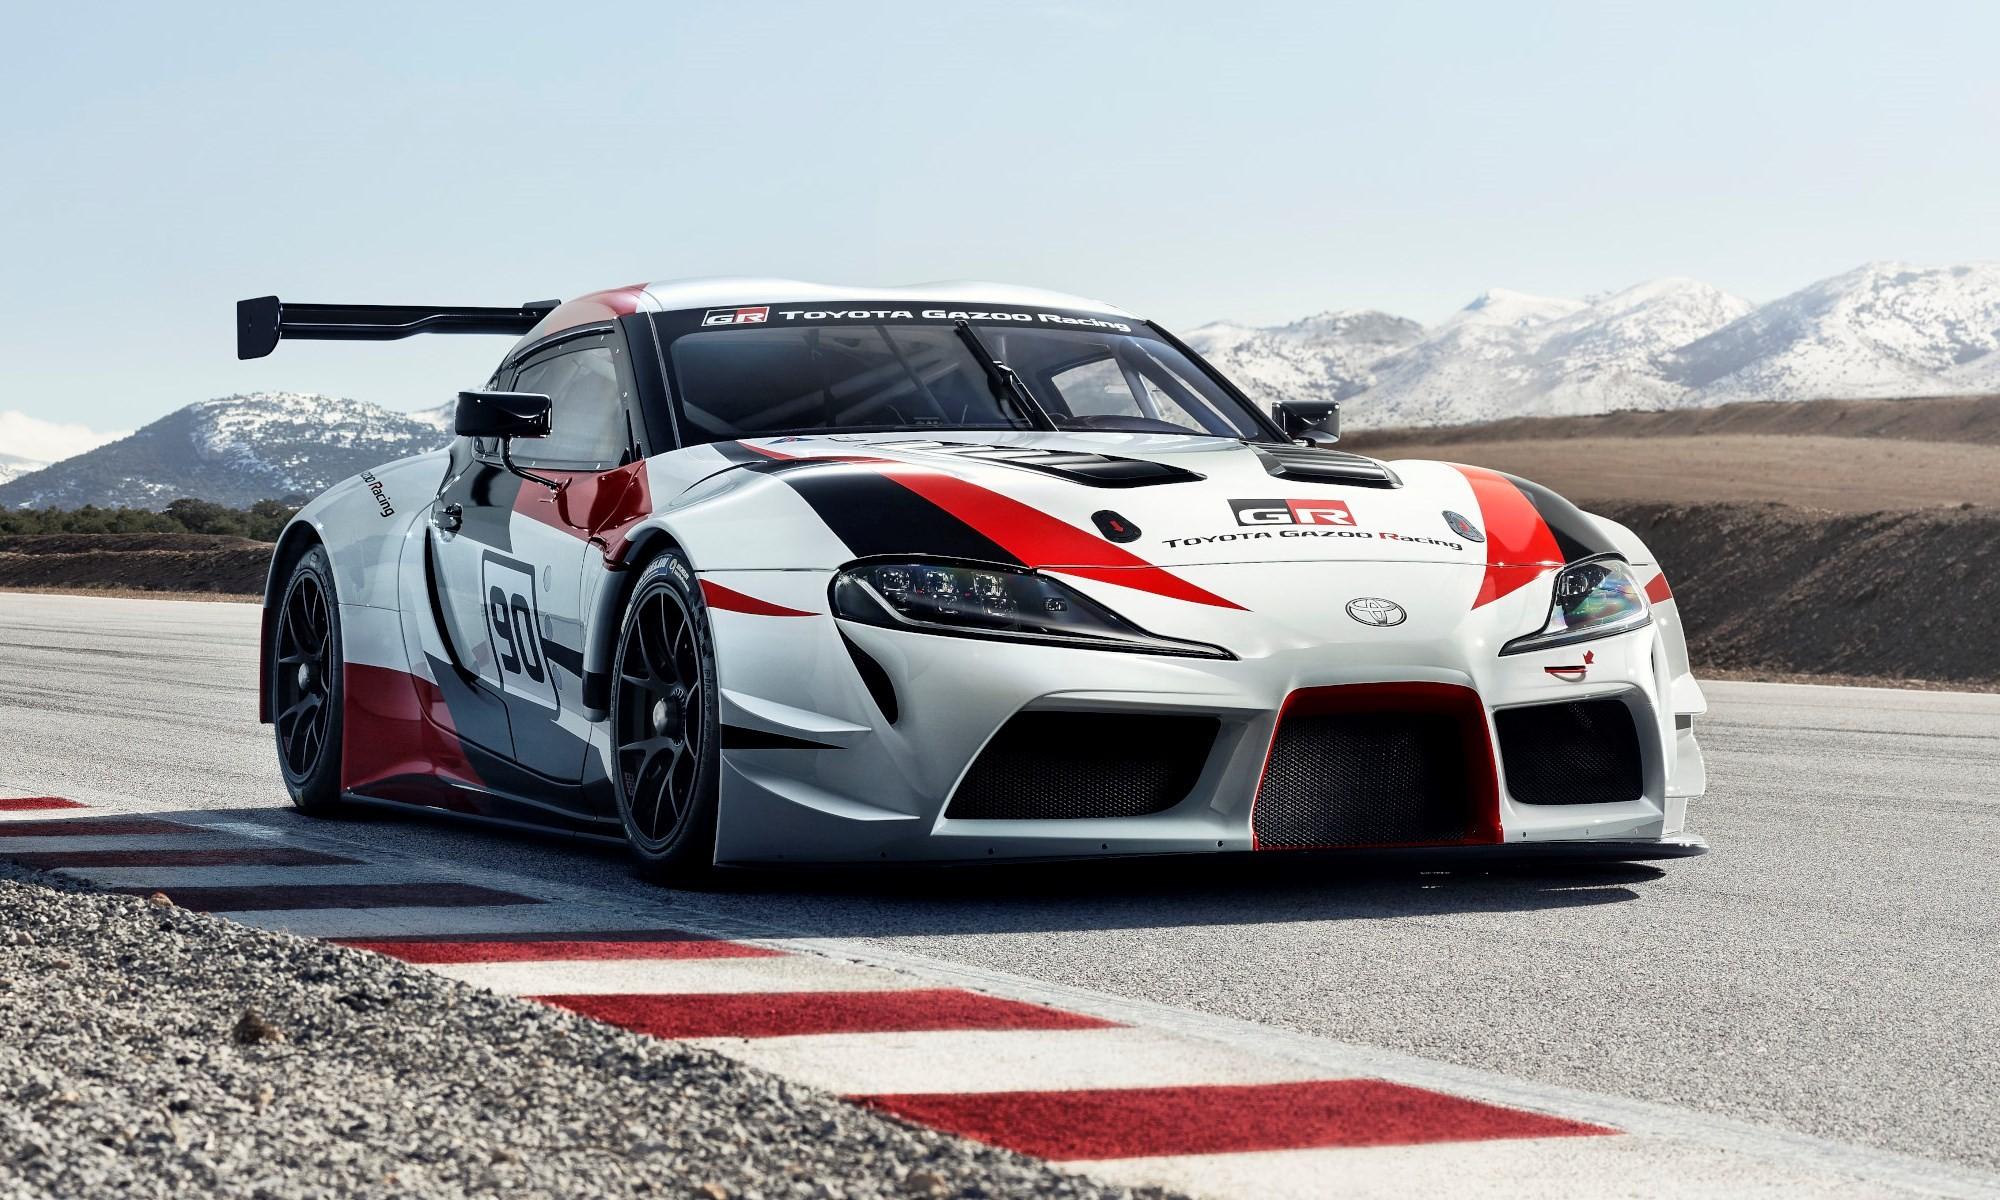 Gazoo Racing Toyota Supra concept